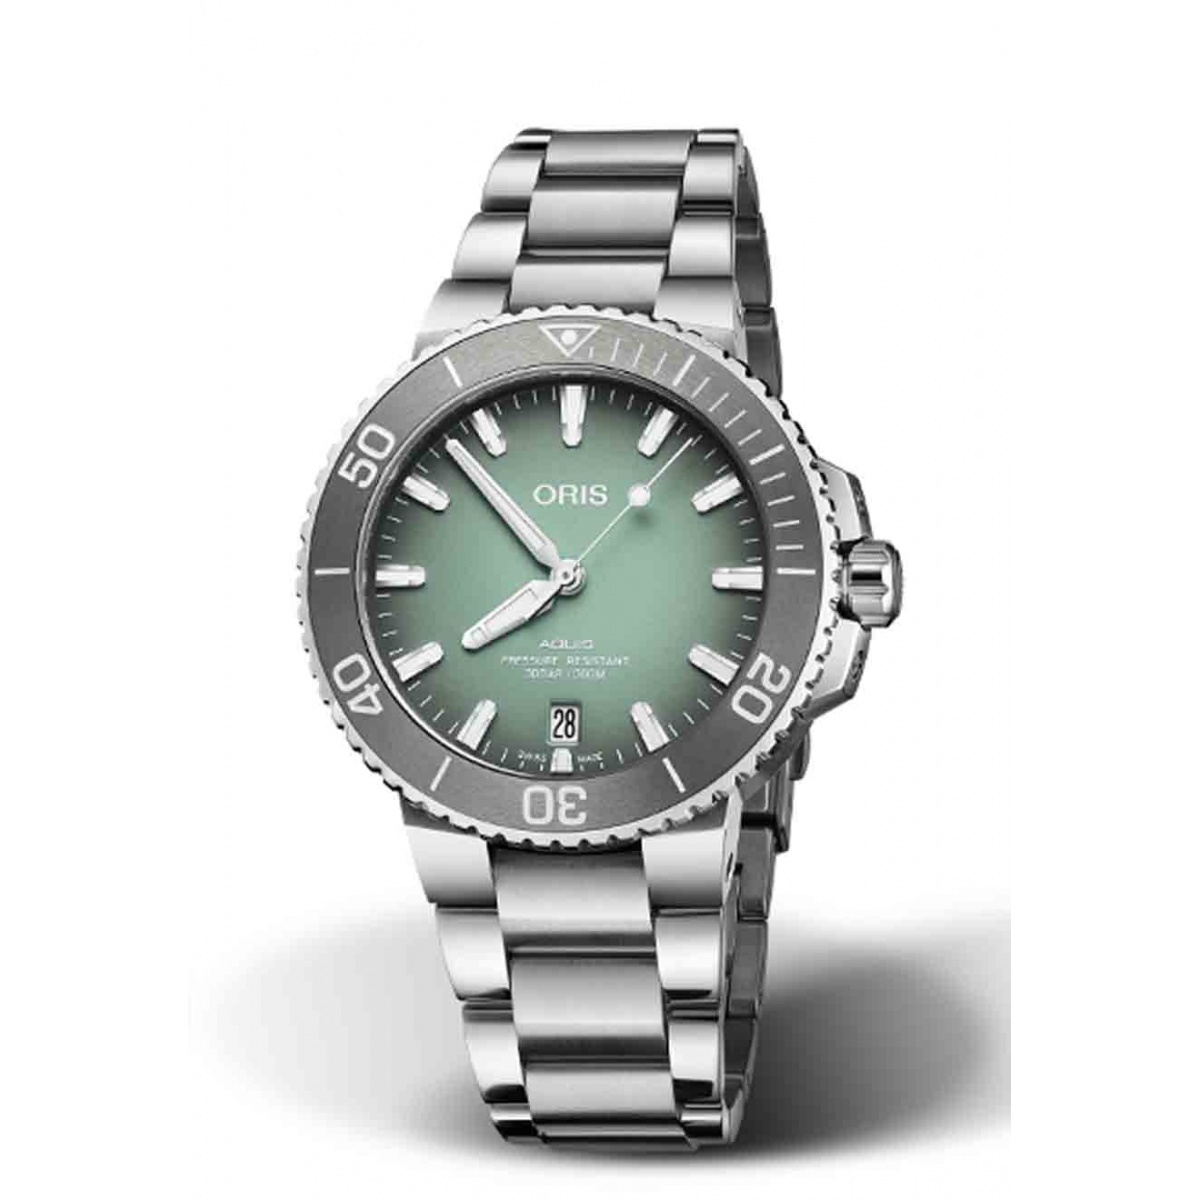 ORIS AQUIS DATE 300 M ∅39,5 mm, Esfera verde, brazalete de acero